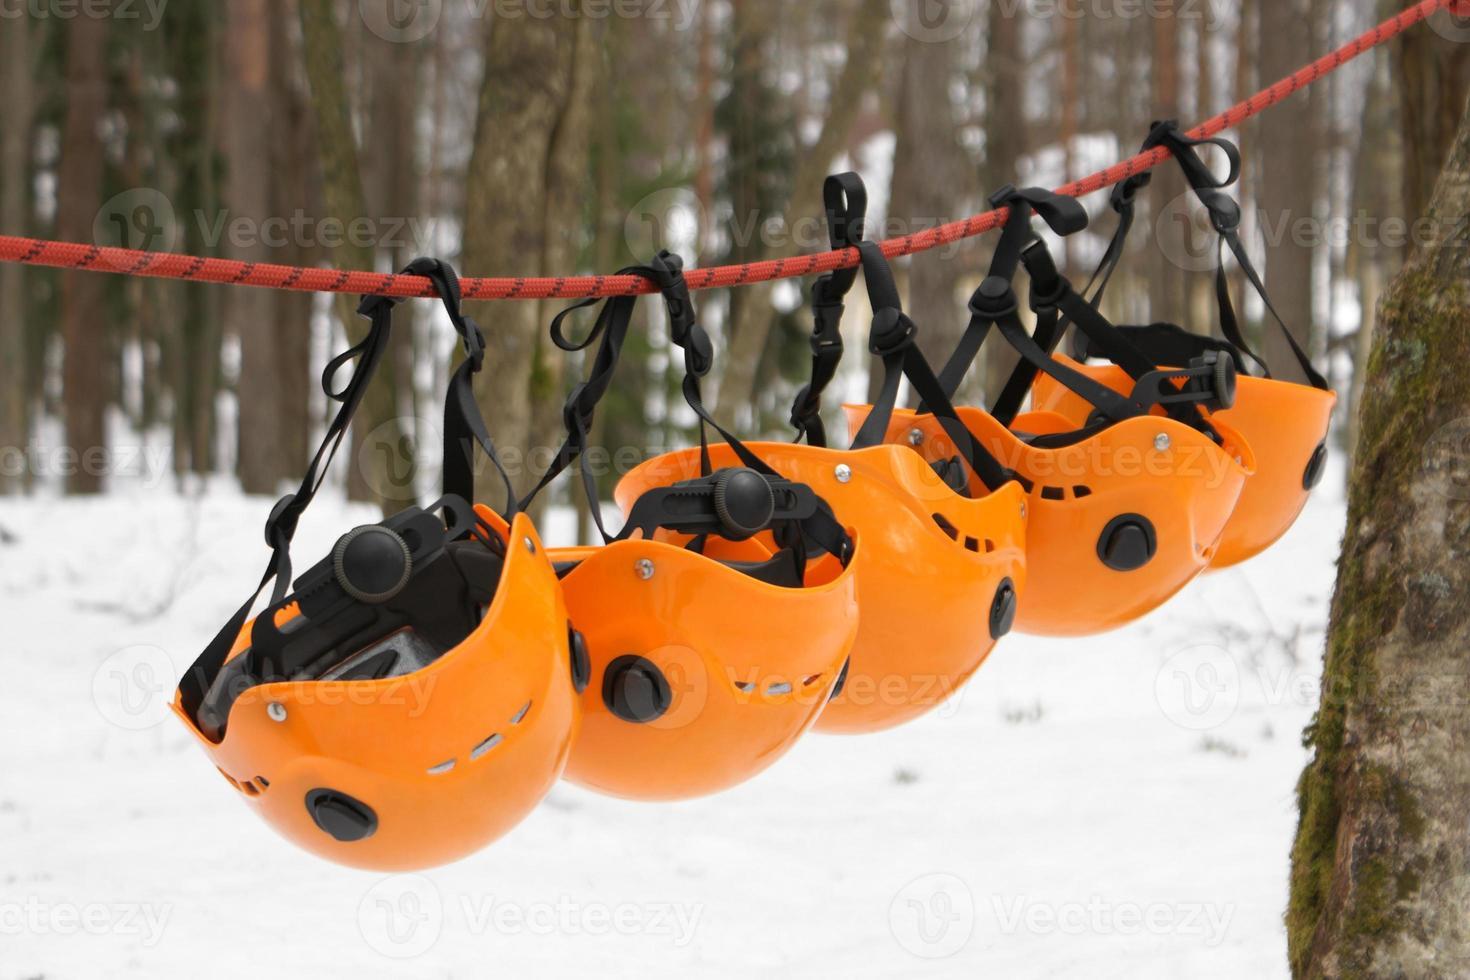 los cascos naranjas foto